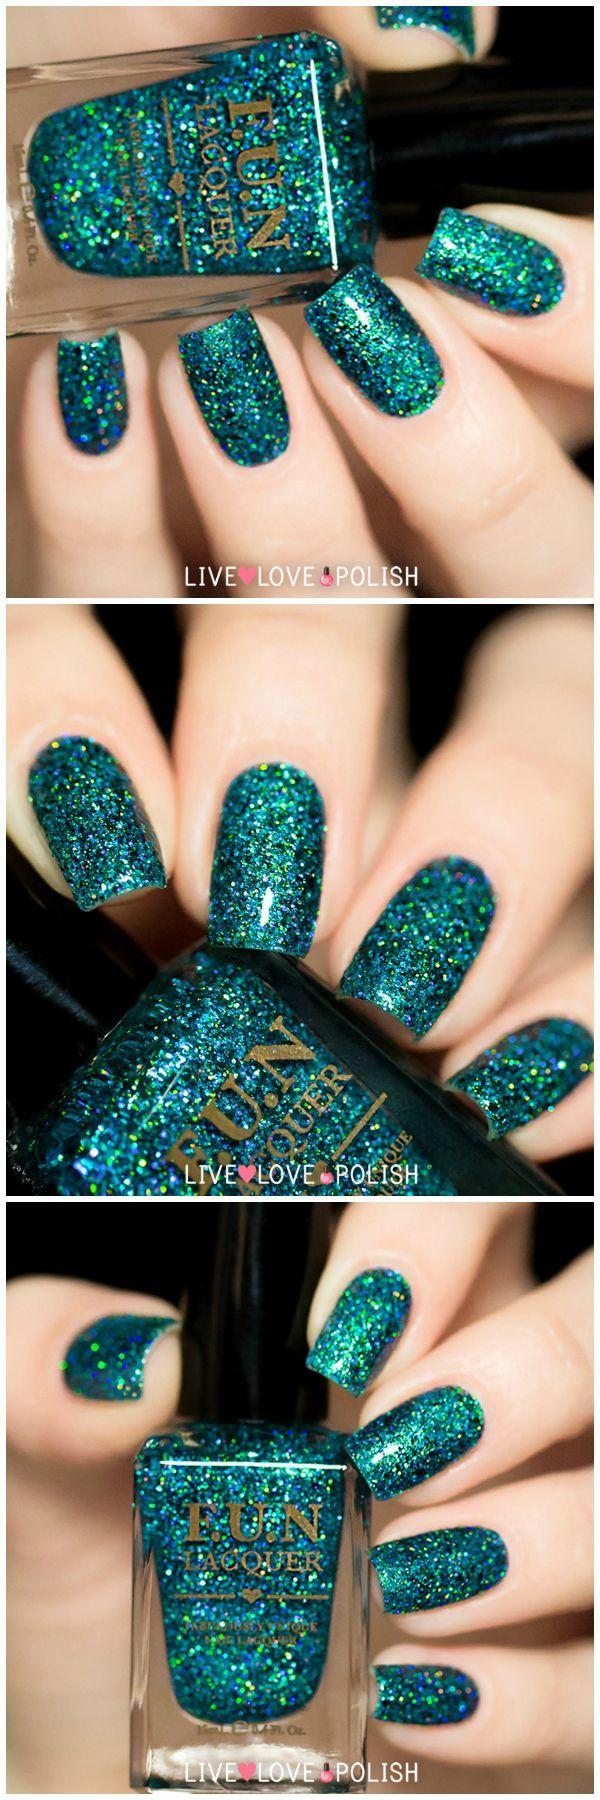 Teal glitter nail polish